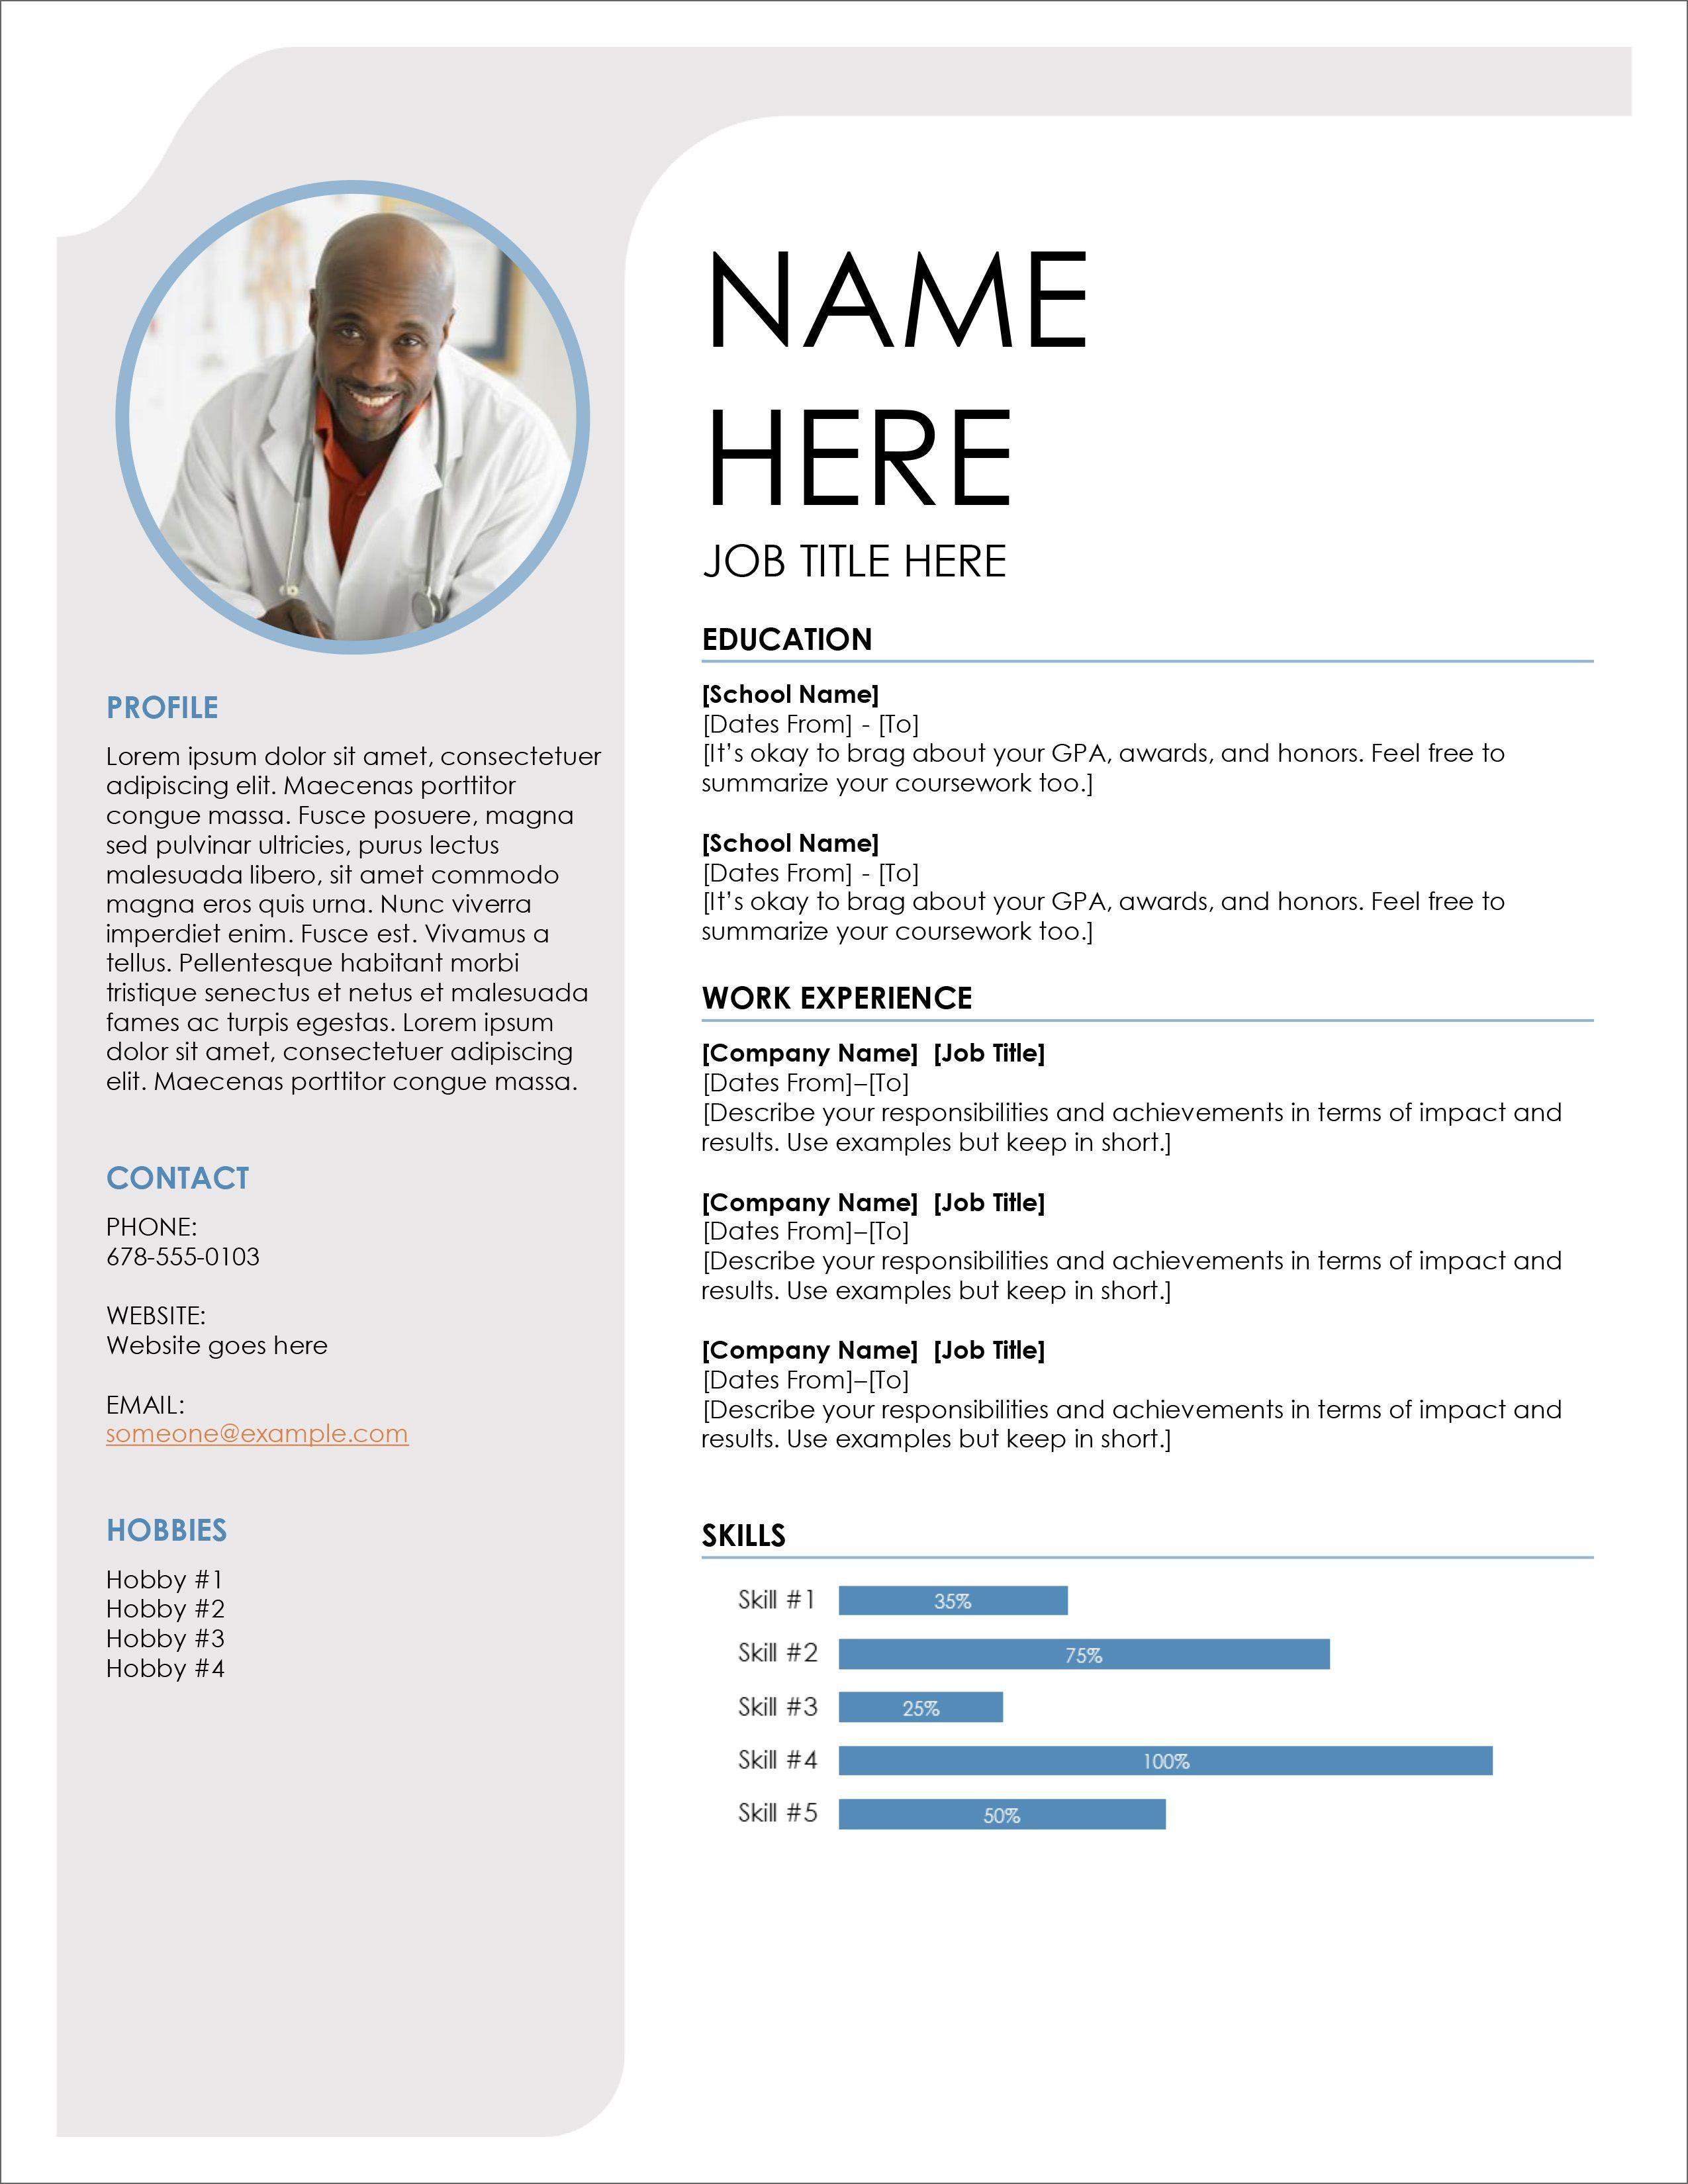 nuik noke Professional Resume Templates Word Free